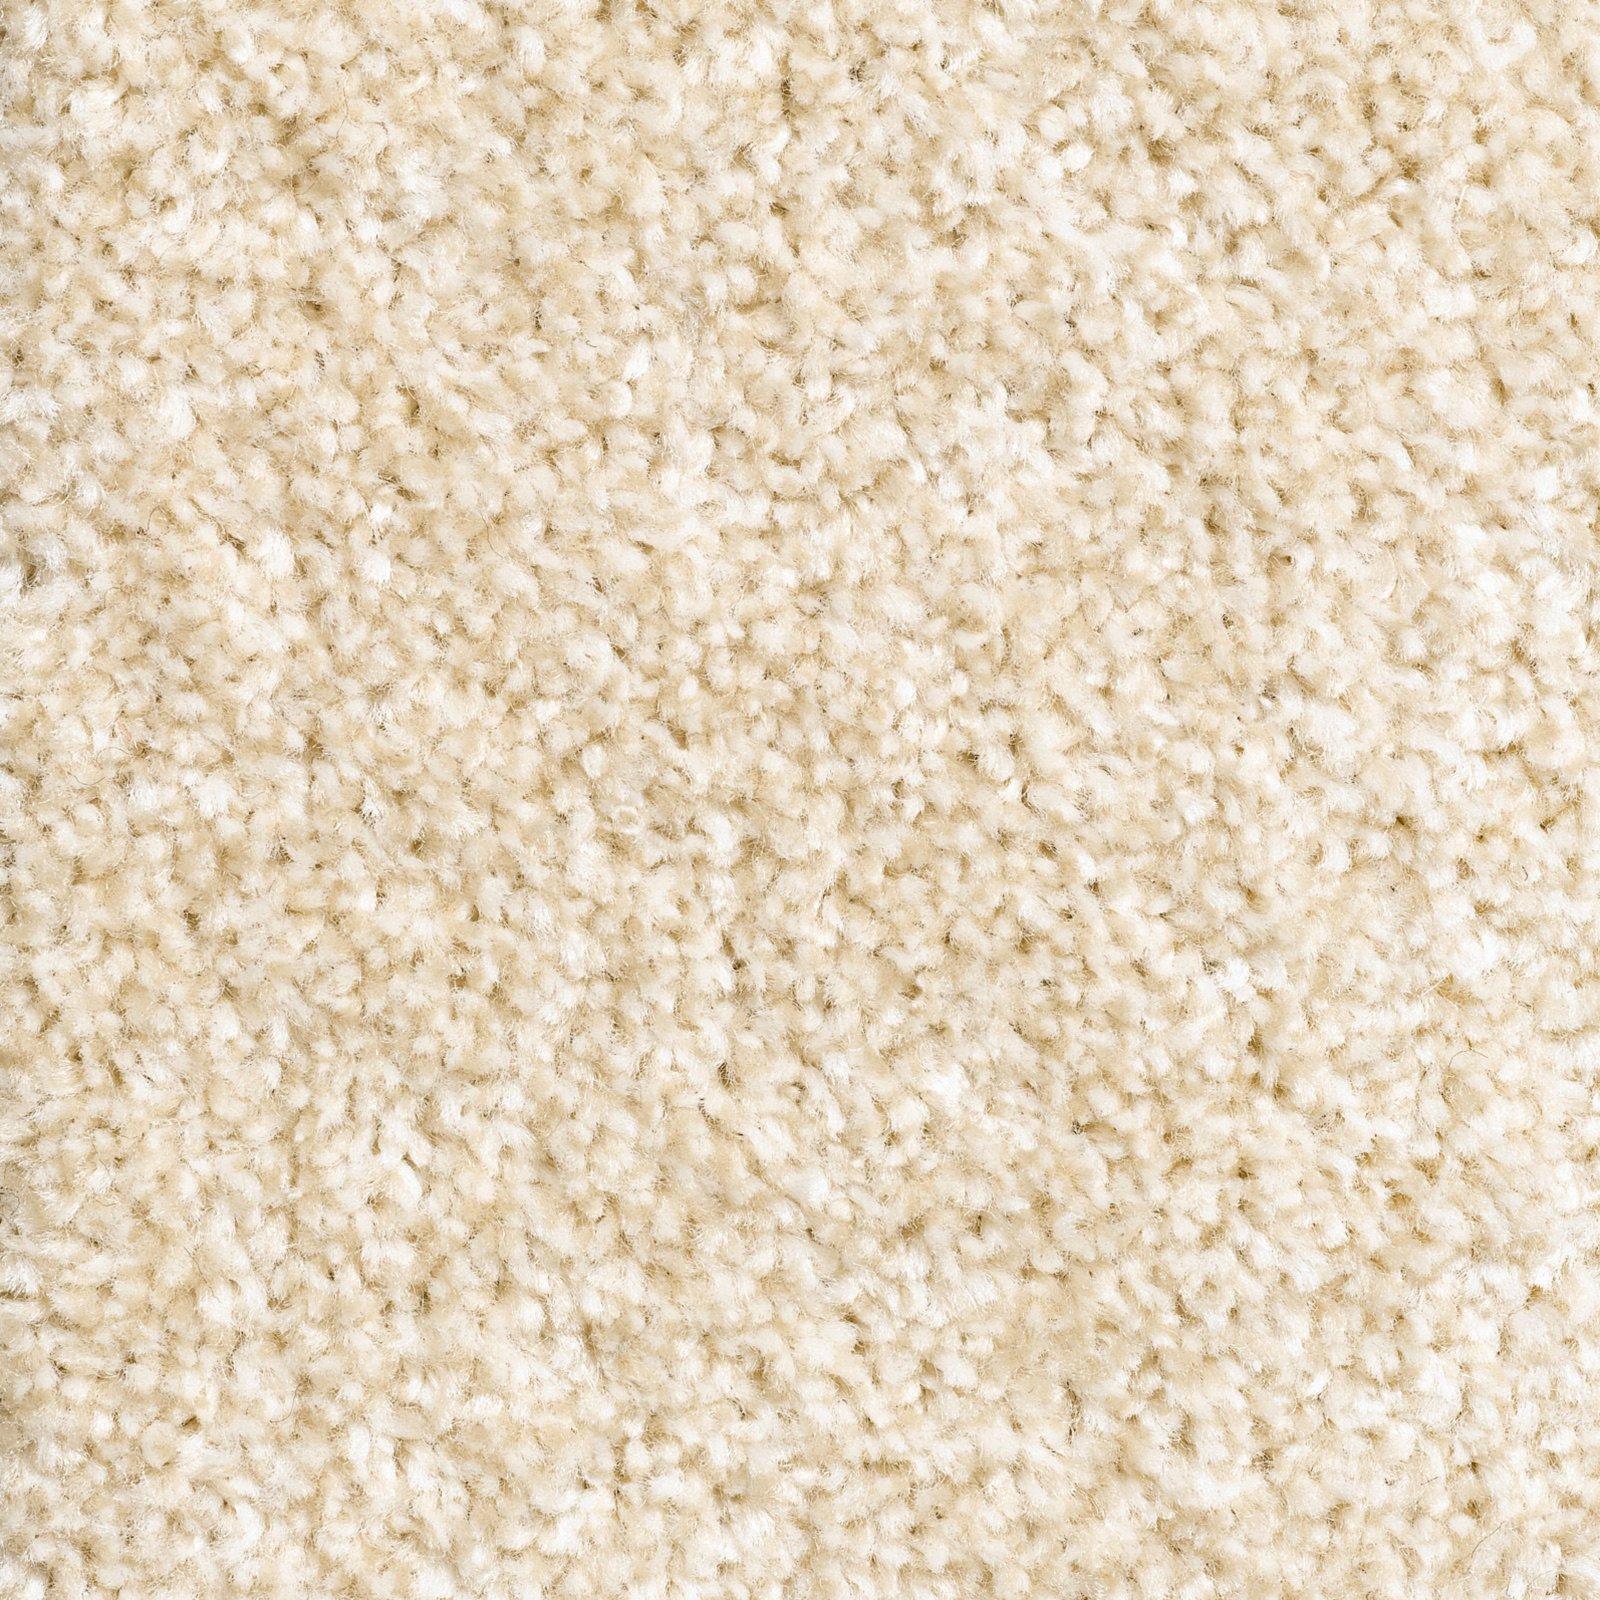 velours teppichboden milano beige 4 meter breit teppichboden bodenbel ge baumarkt. Black Bedroom Furniture Sets. Home Design Ideas